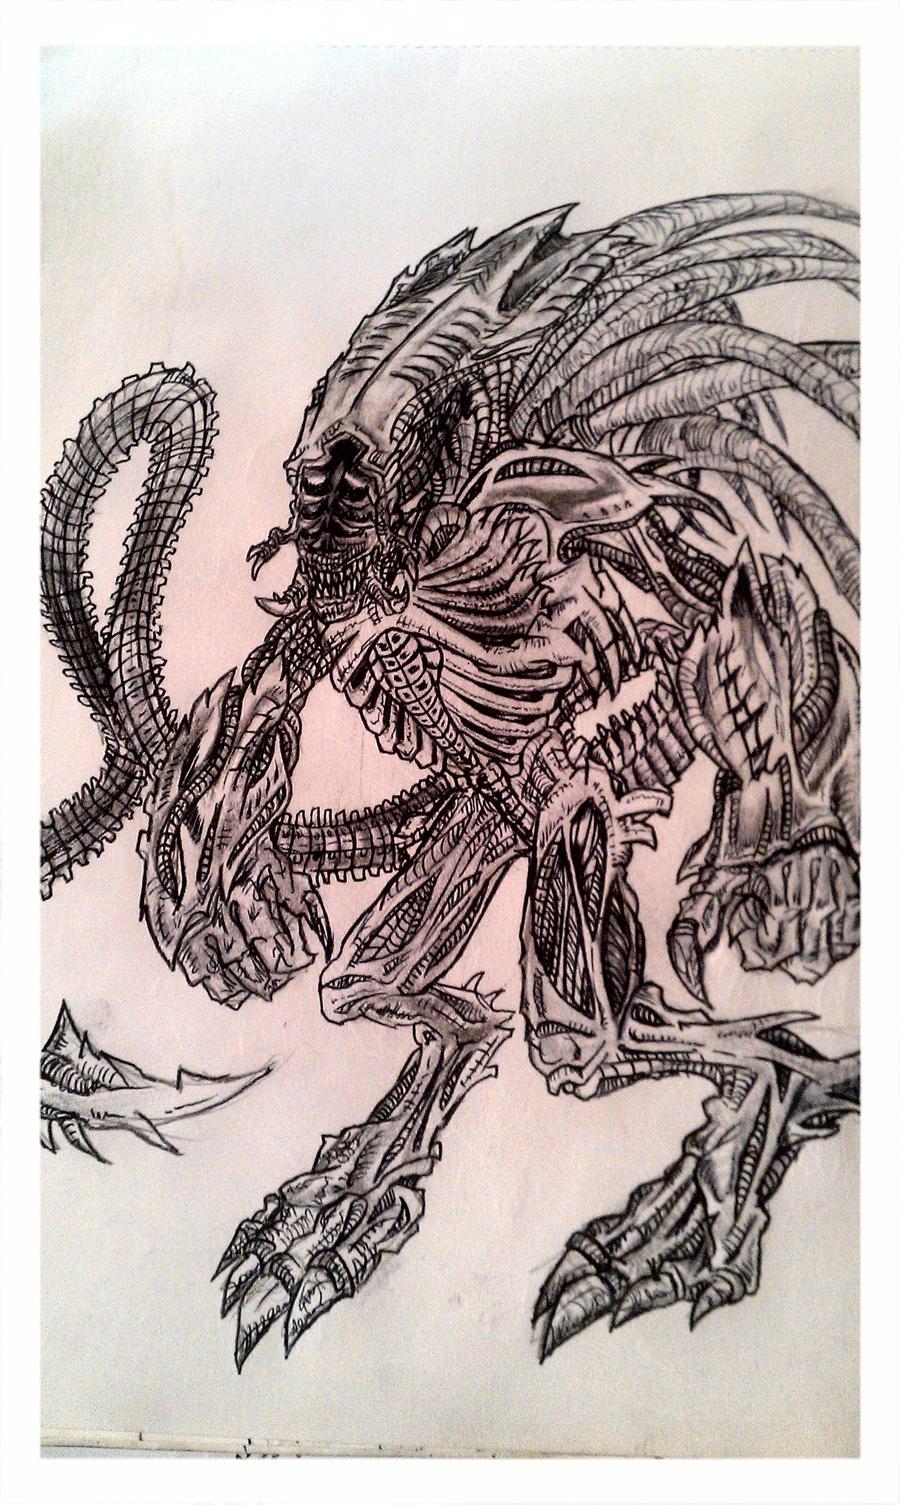 aliens vs predator drawings - photo #38